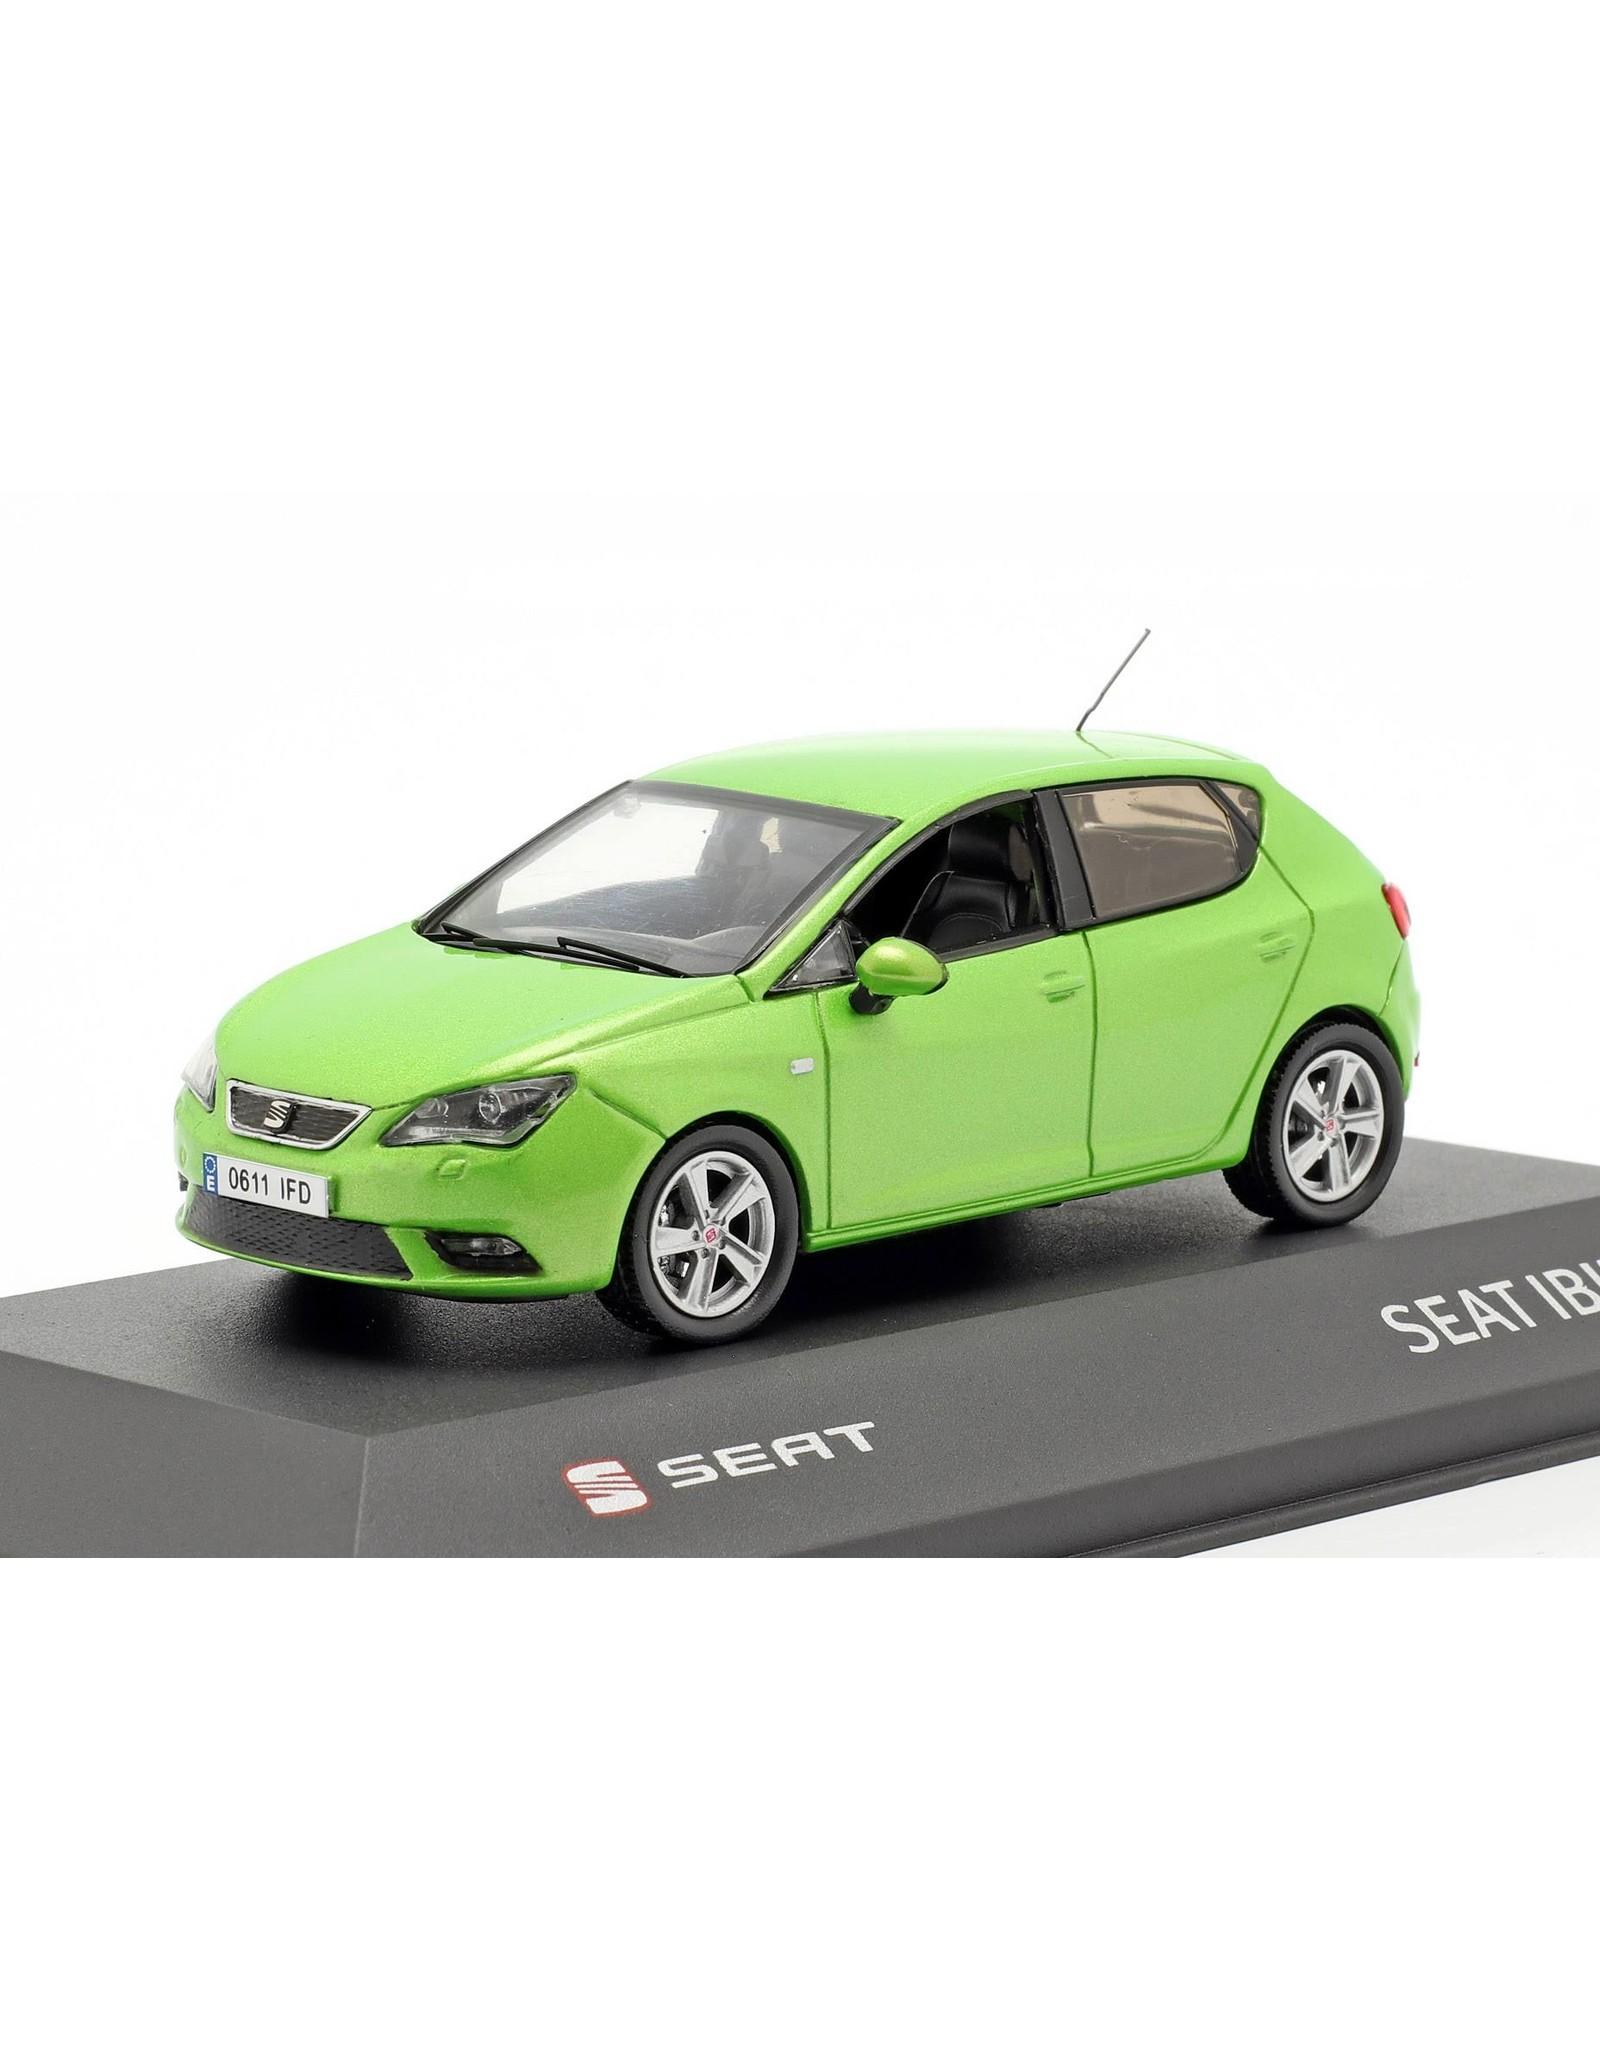 Seat Seat Ibiza - 1:43 - Seat Auto Emoción